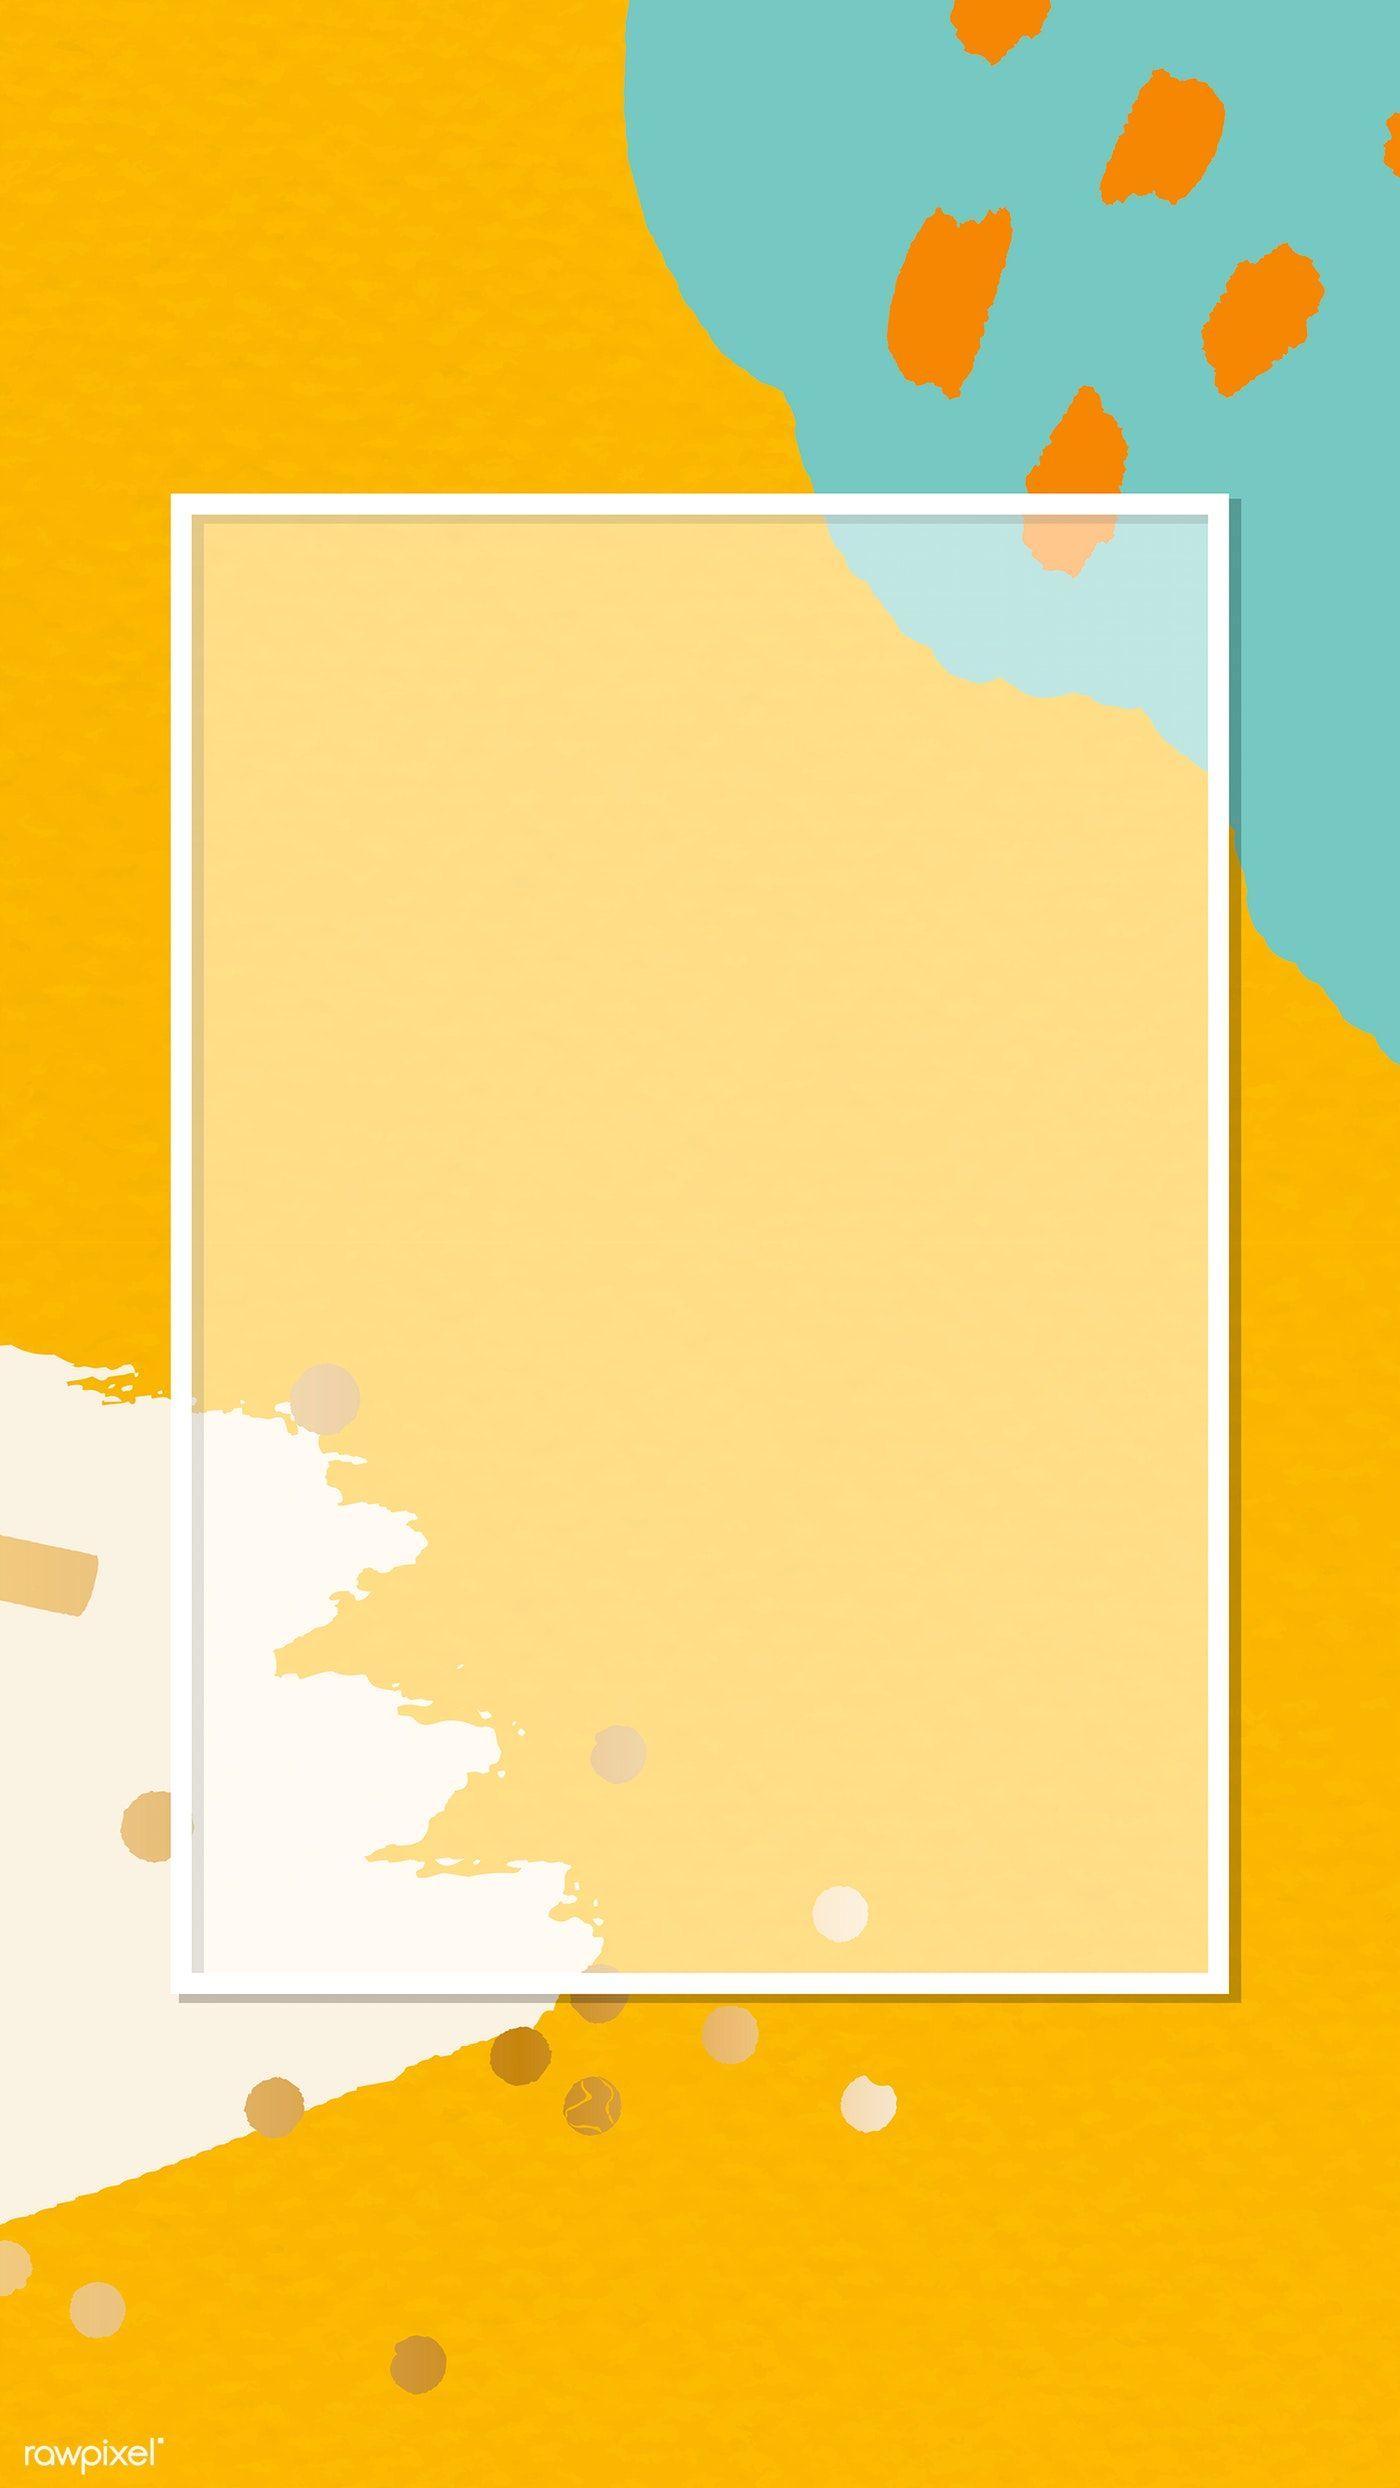 Download Premium Vector Of Transparent Frame On Memphis Pattern Mobile Cute Patterns Wallpaper Funny Phone Wallpaper Abstract Iphone Wallpaper